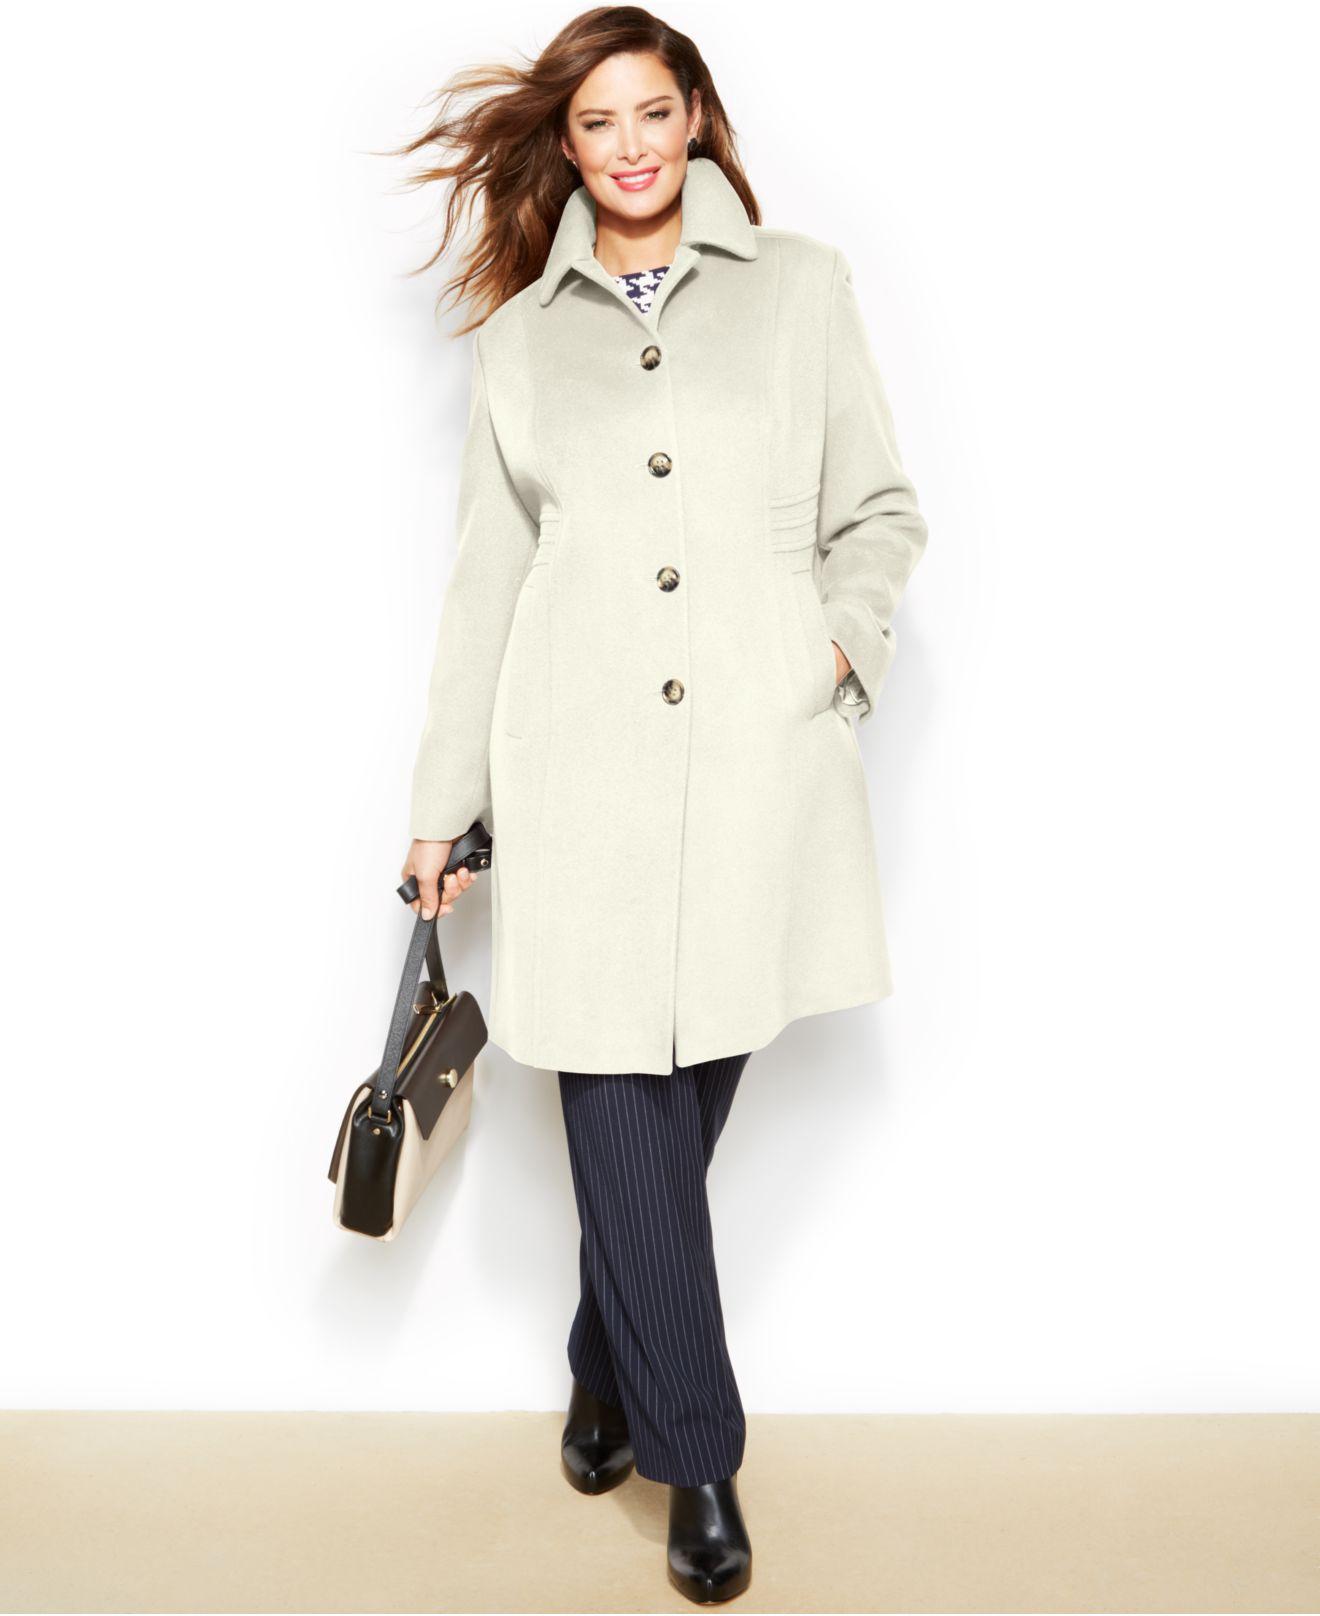 Anne klein Plus Size Wool-Cashmere-Blend Walker Coat in White | Lyst